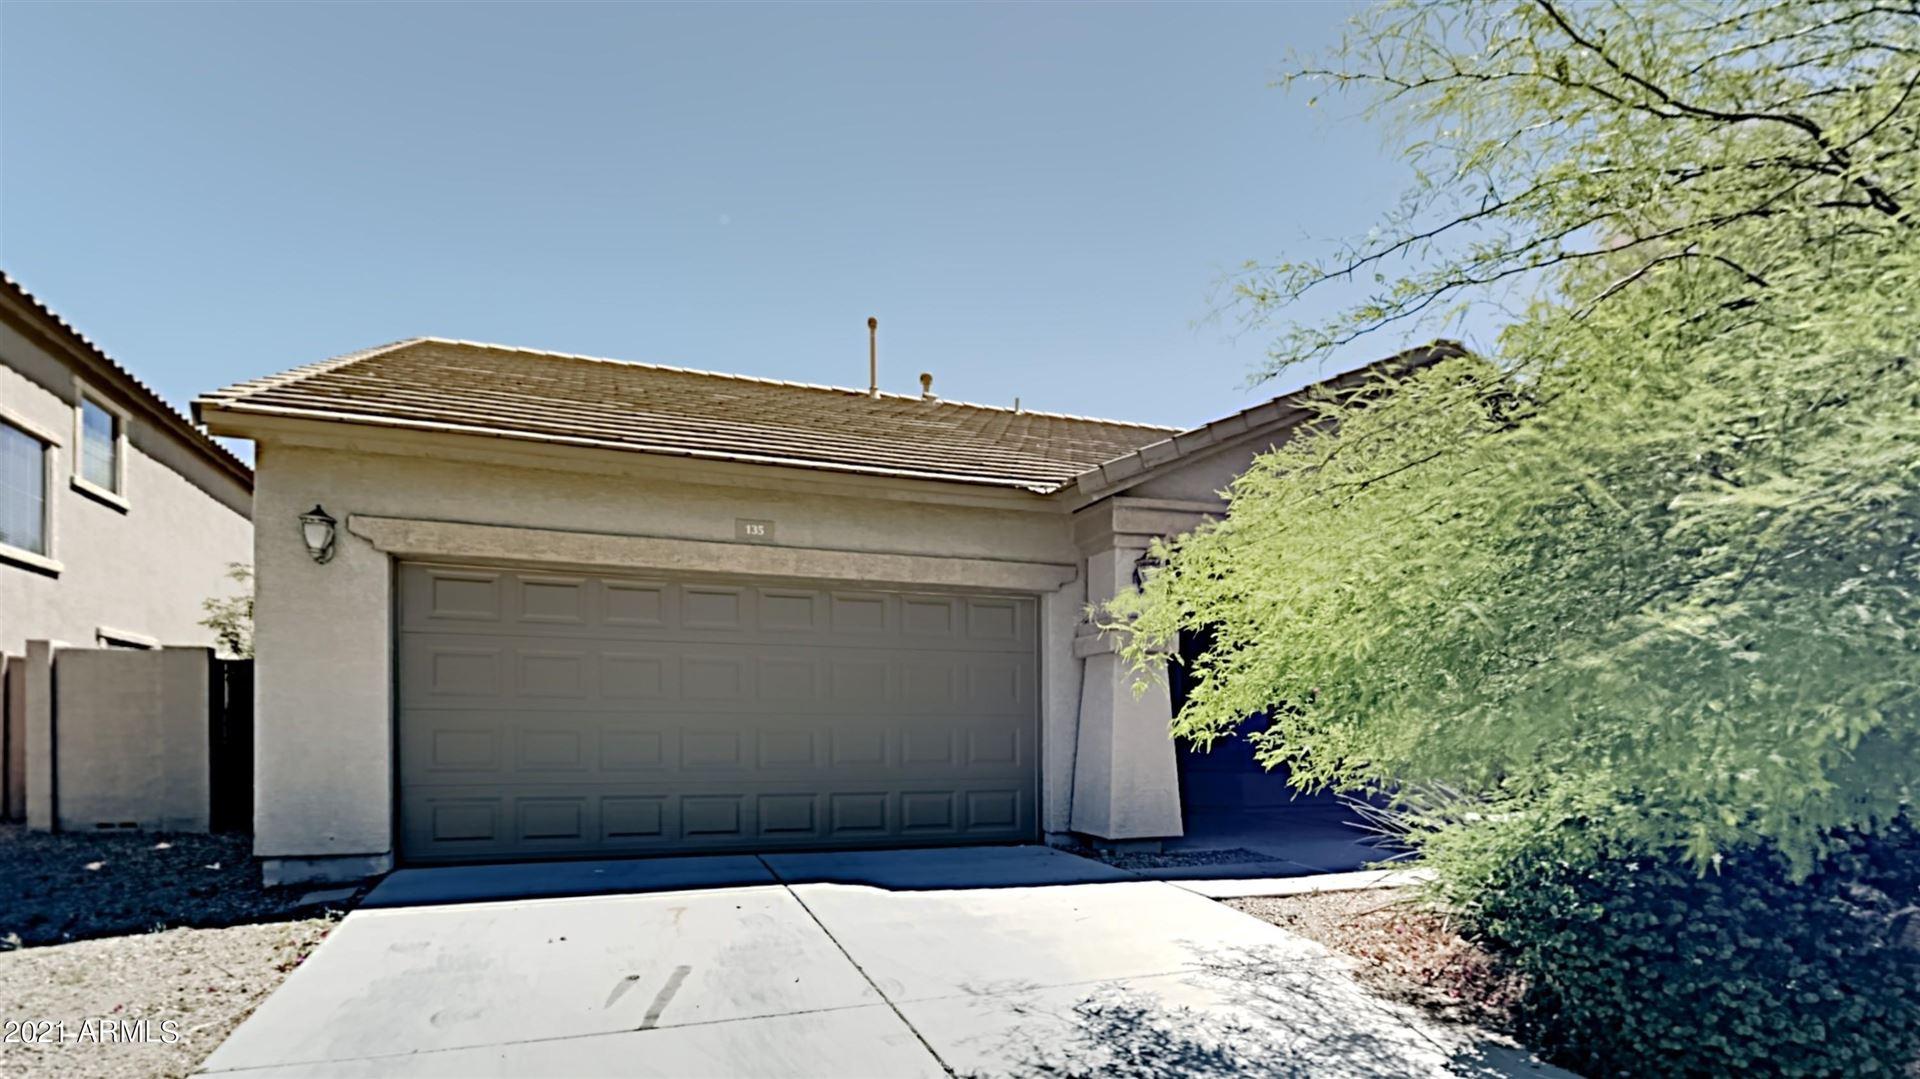 135 S 108TH Avenue, Avondale, AZ 85323 - MLS#: 6230903